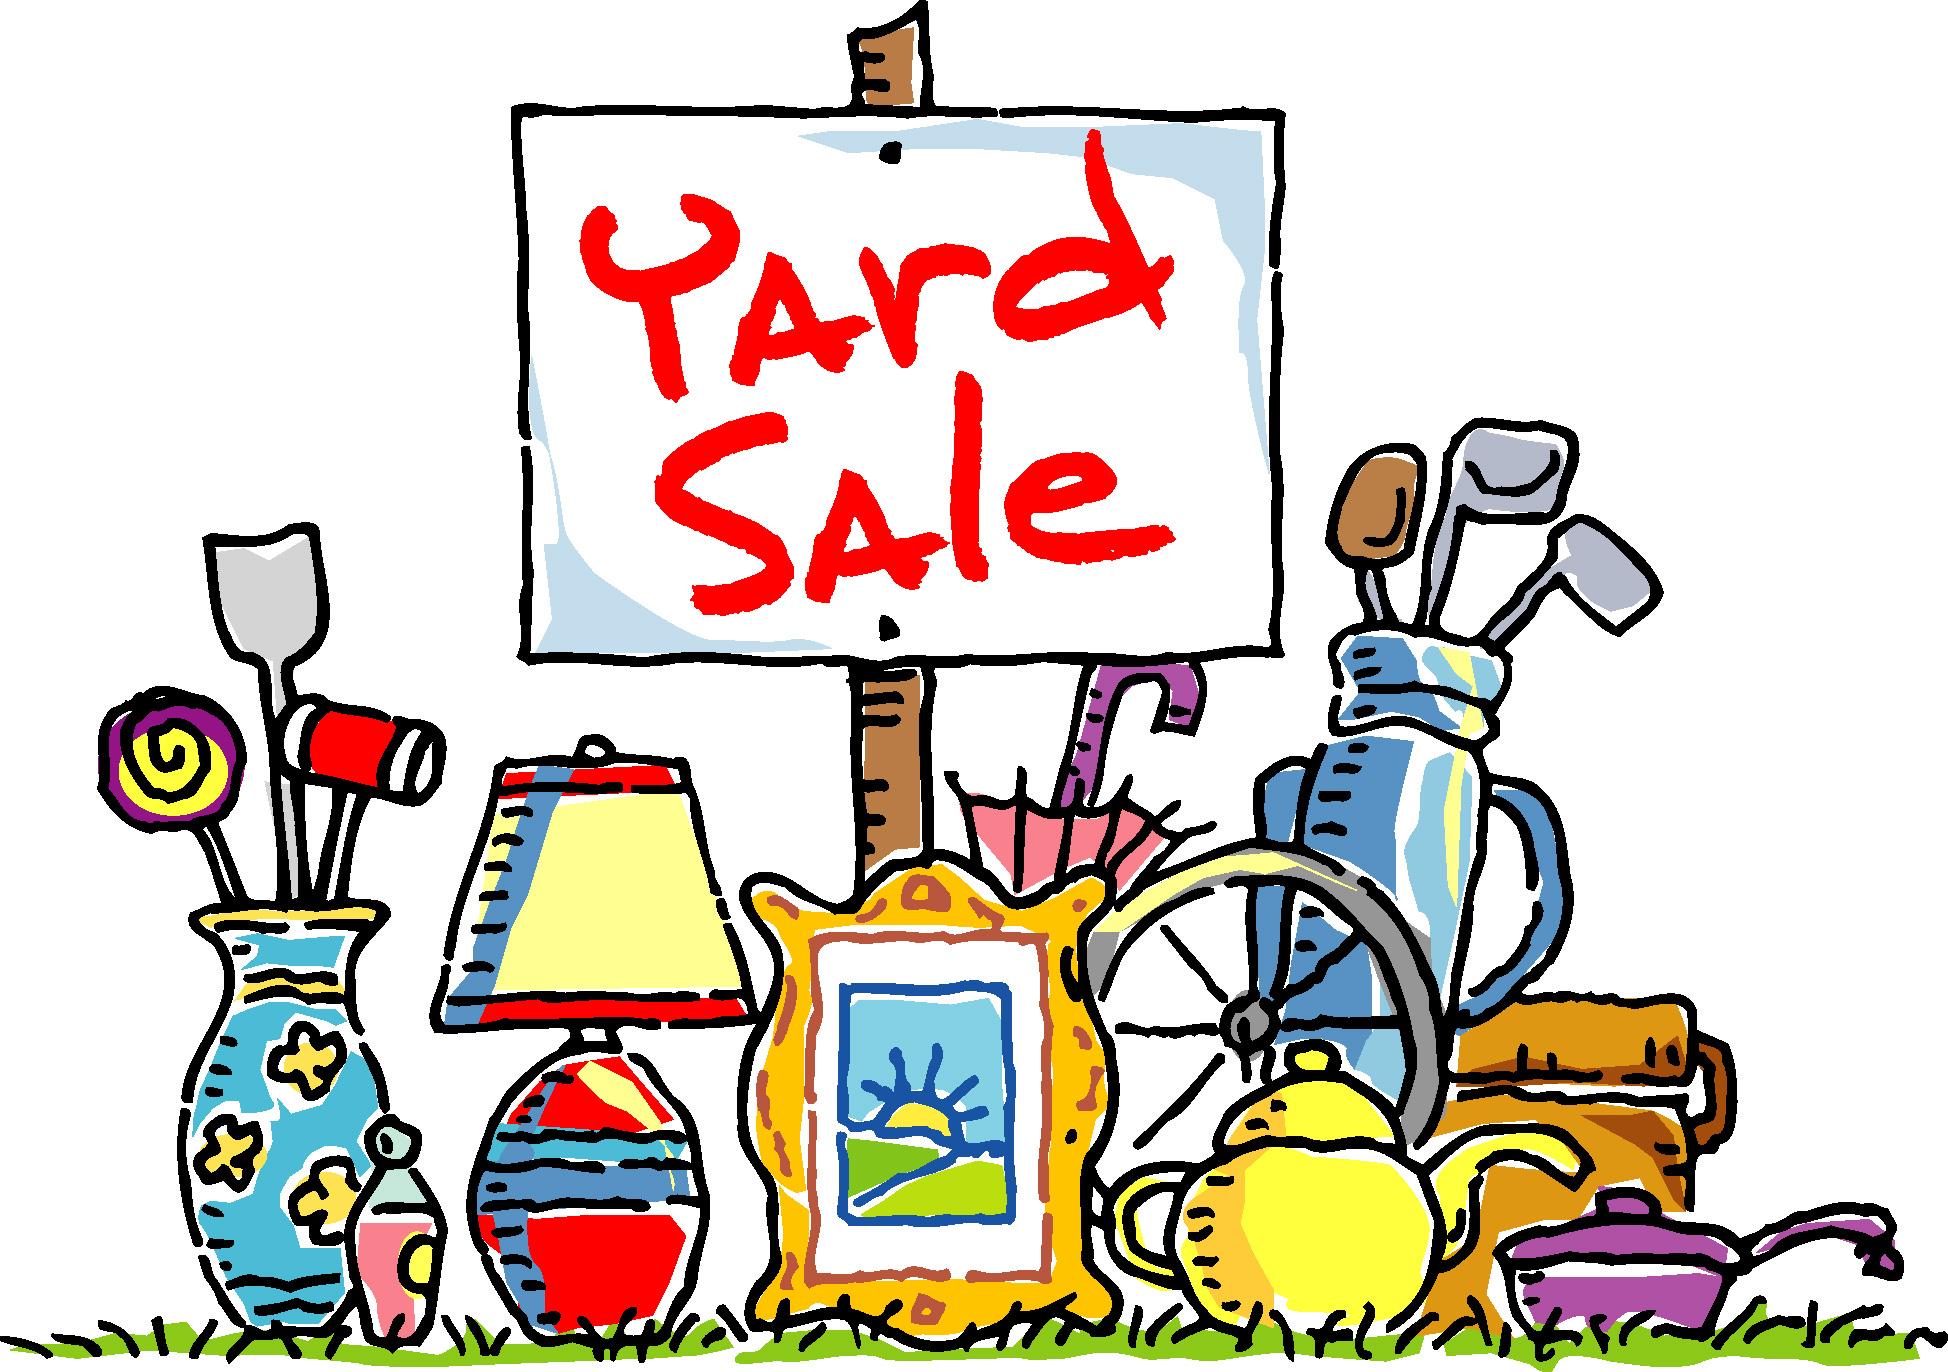 Free Yard Sale Clip Art Clipart-Free yard sale clip art clipart-10